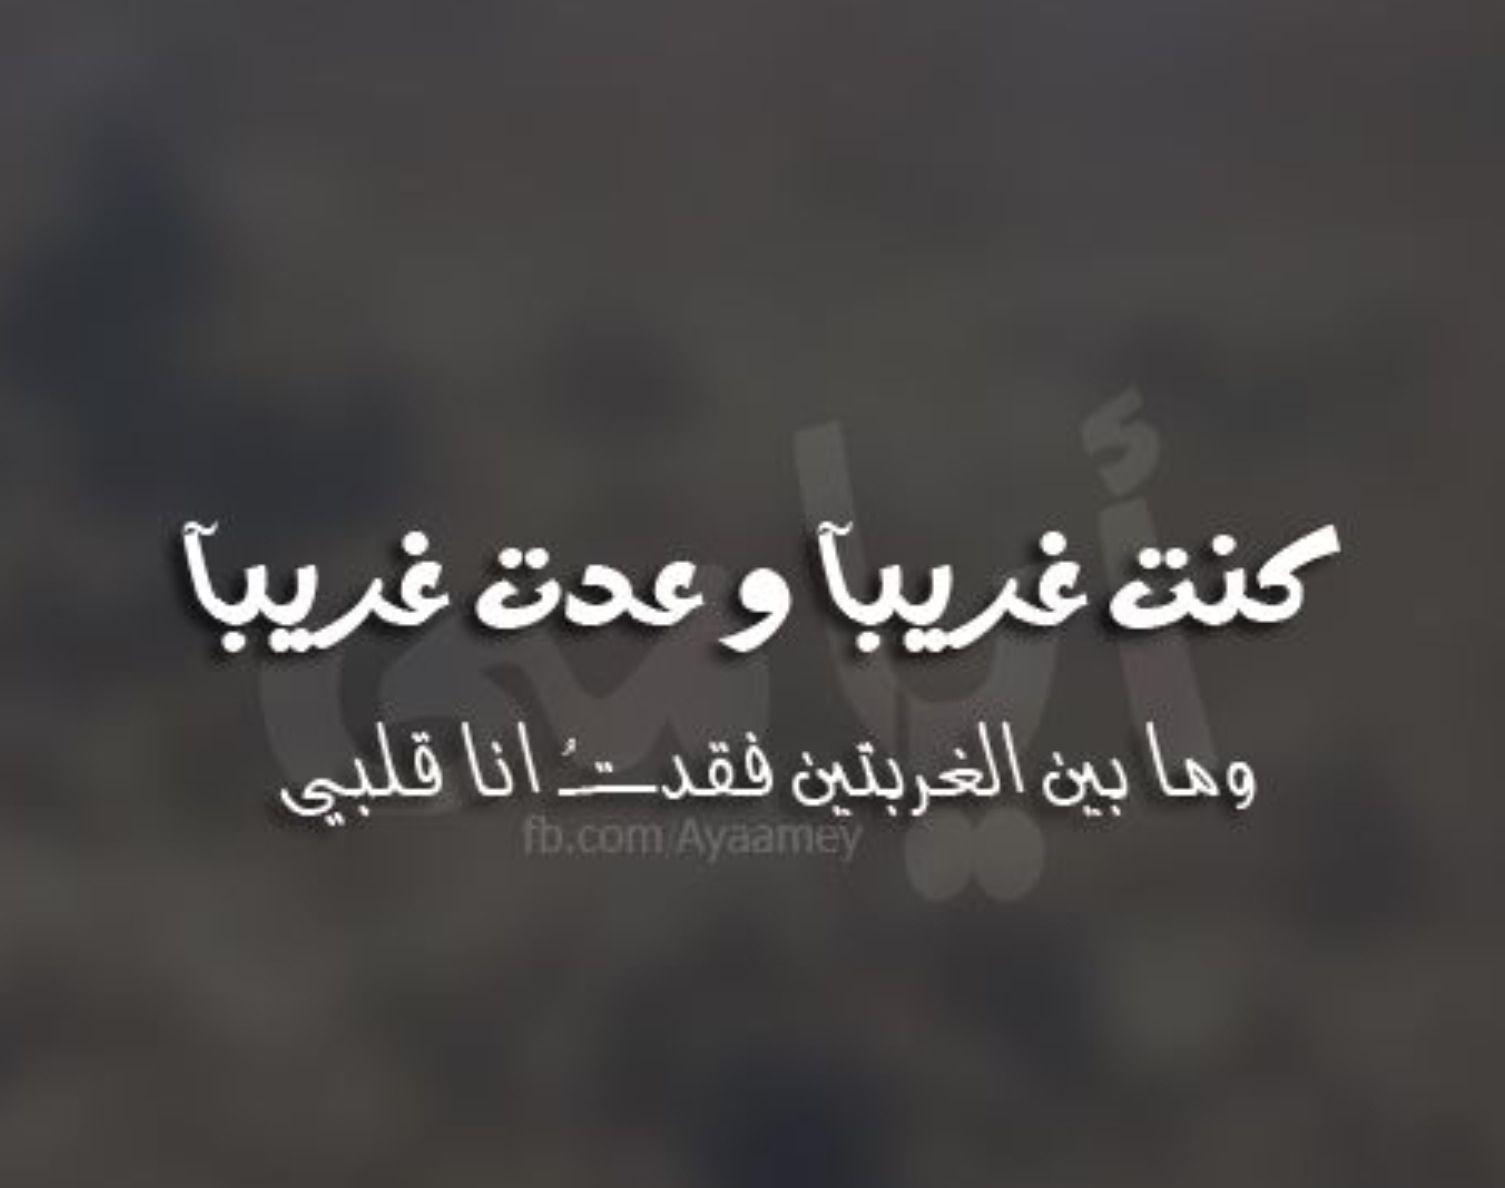 و ما بين الغربيتين فقدت انا قلبي Funny Arabic Quotes Illustration Quotes Arabic Quotes